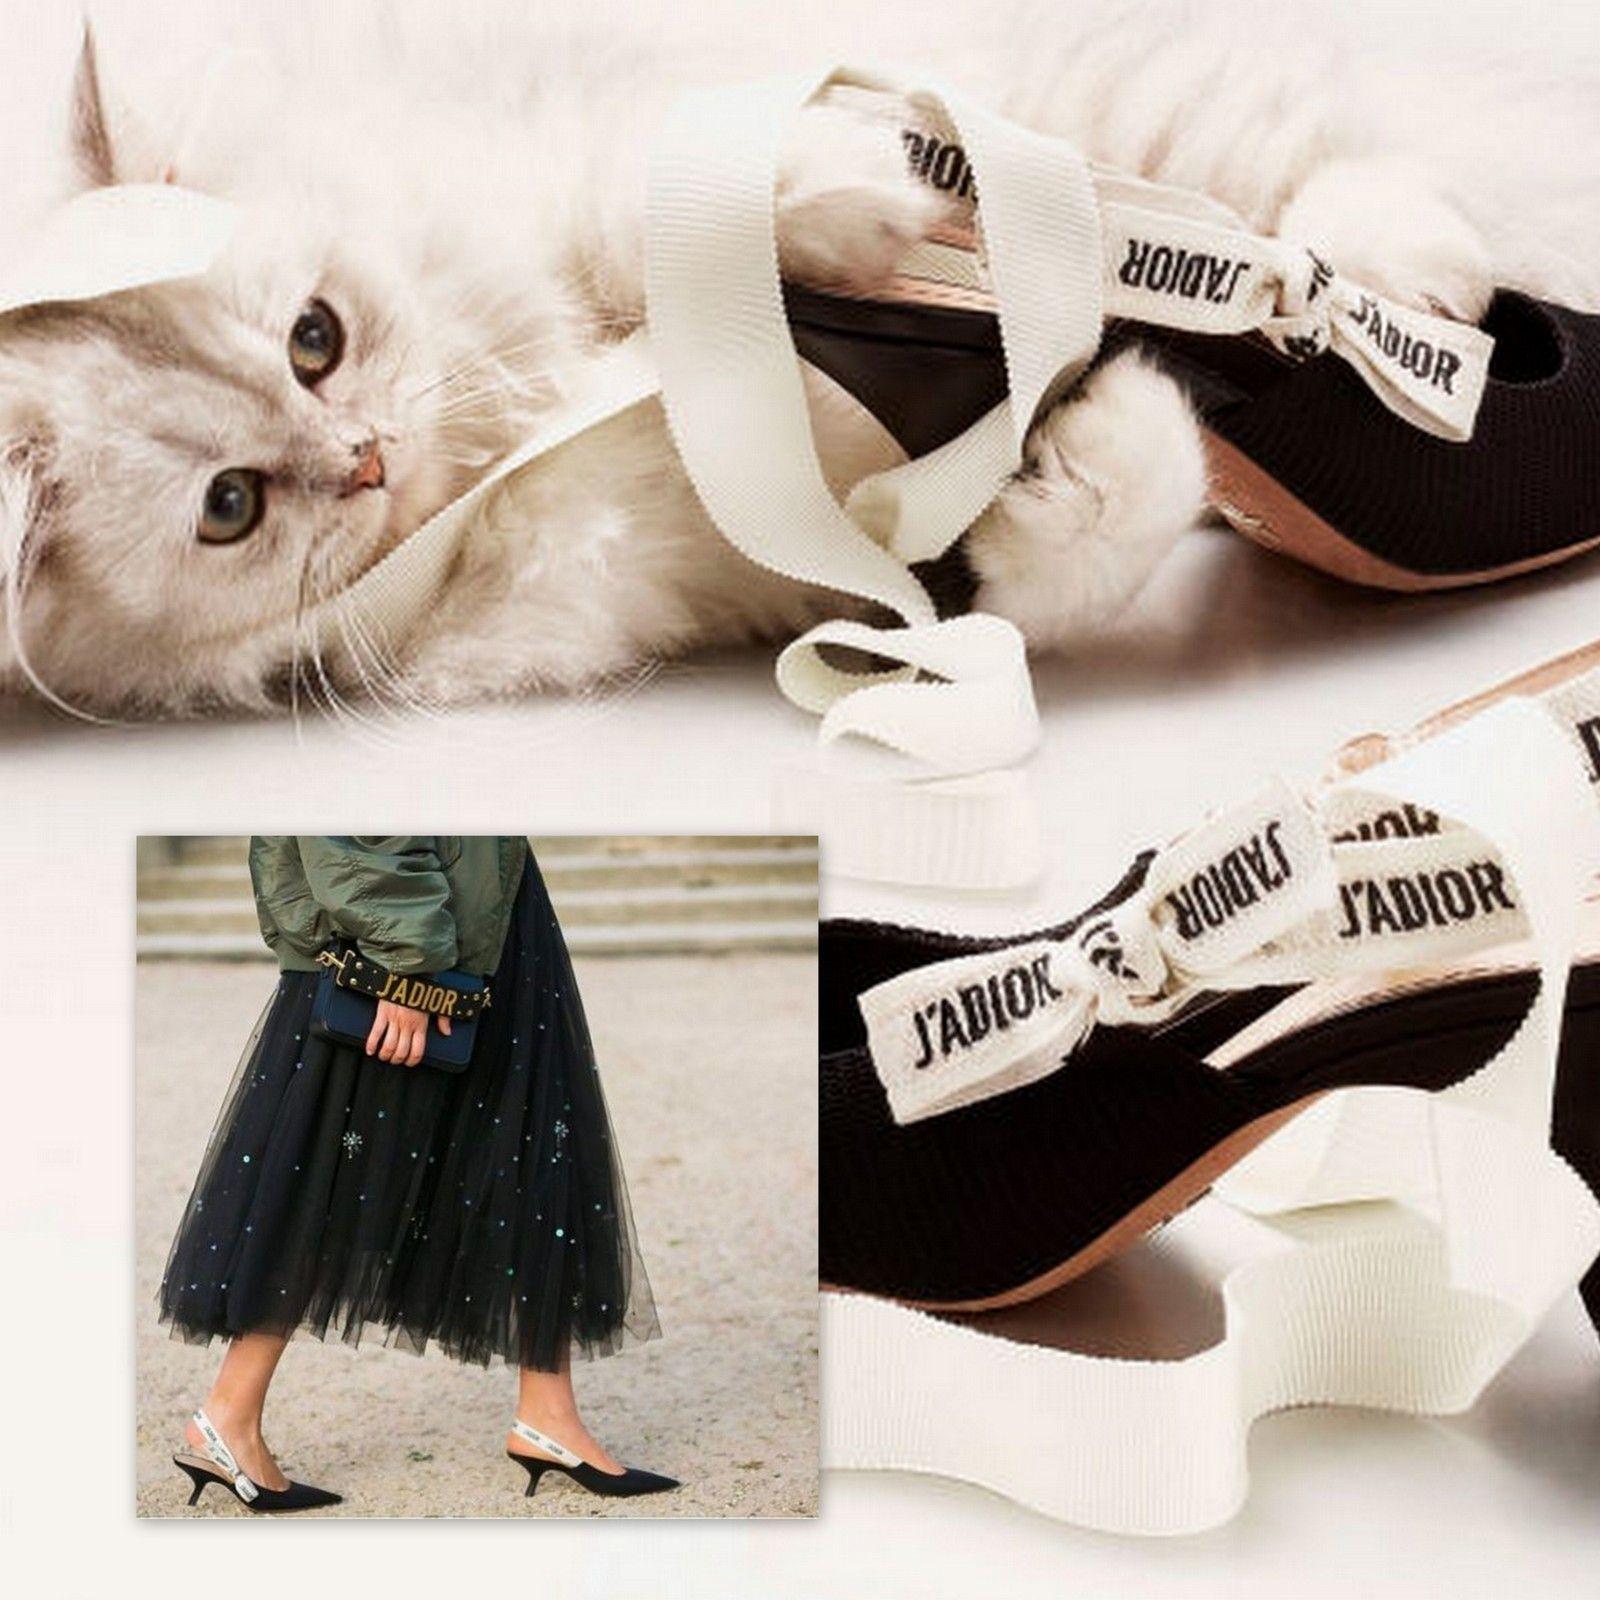 Fashion Inspiration Dior J Adior Kitten Heel Pump Style Inspiration Kitten Heel Pumps Fashion